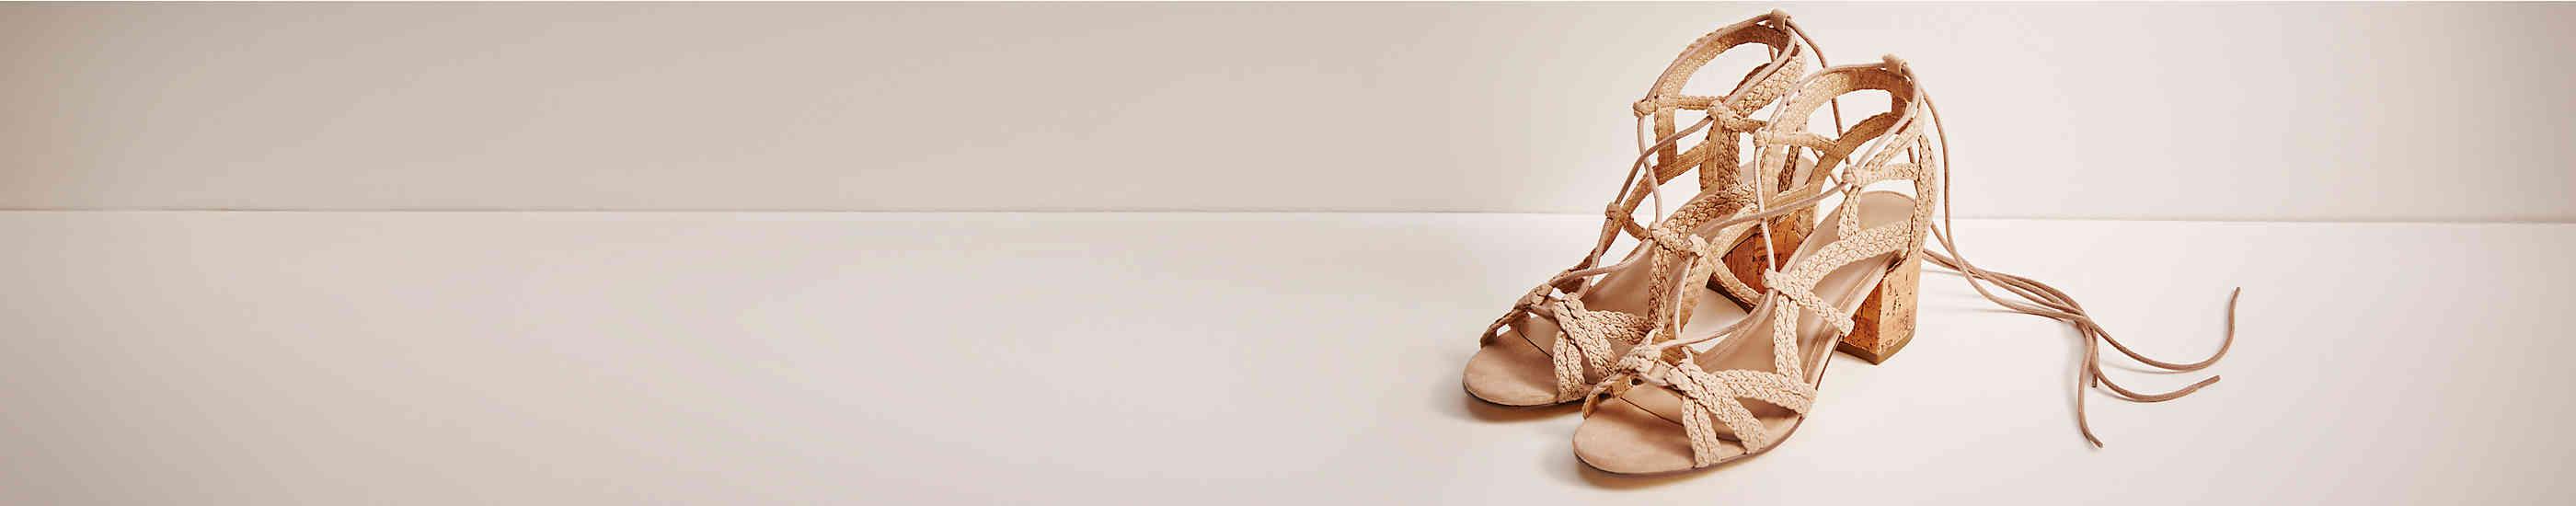 Women s Sandals Summer Shoes & Wedge Sandals